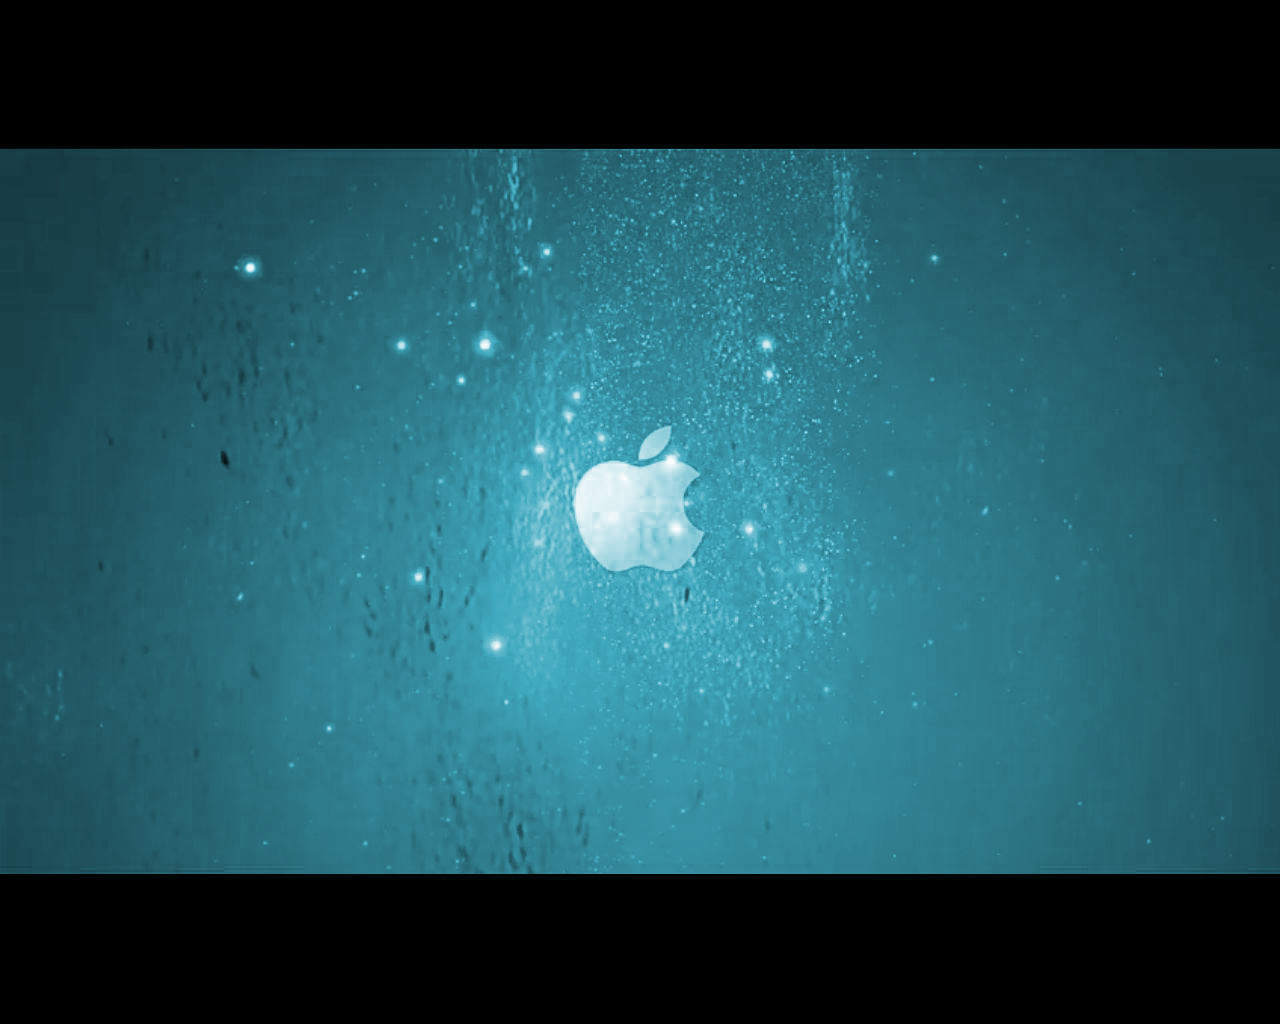 Gallery For > Best Mac Wallpaper